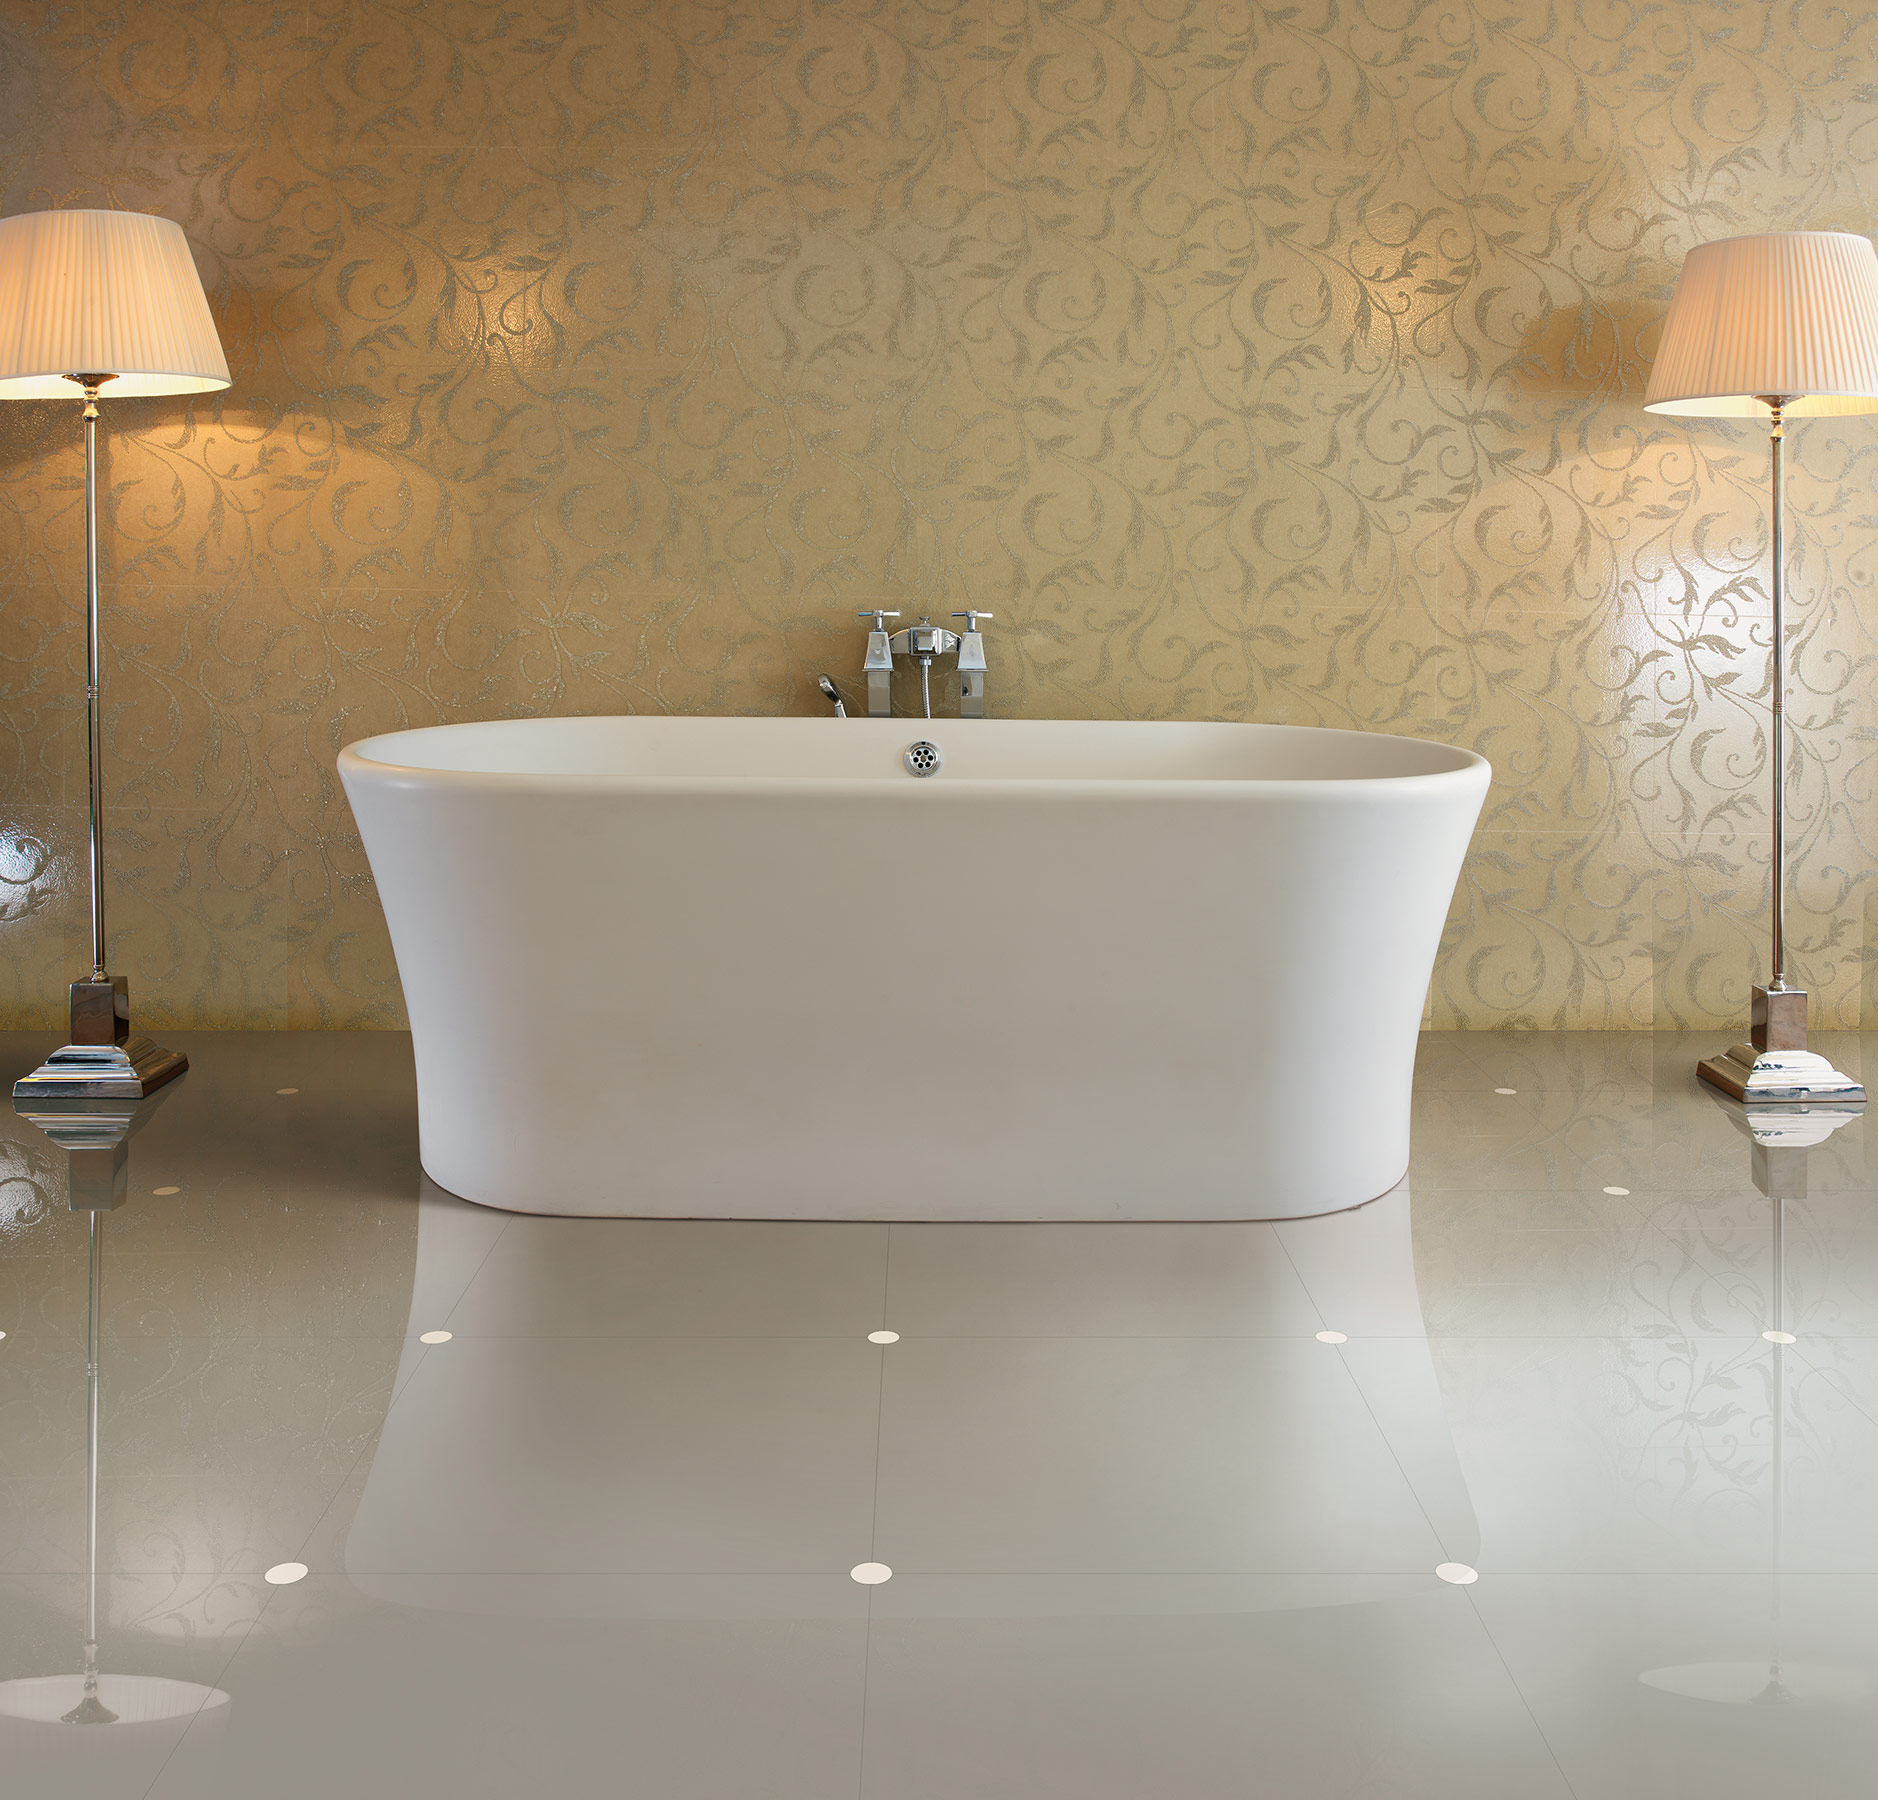 Modern Fusion Freestanding Bathtub